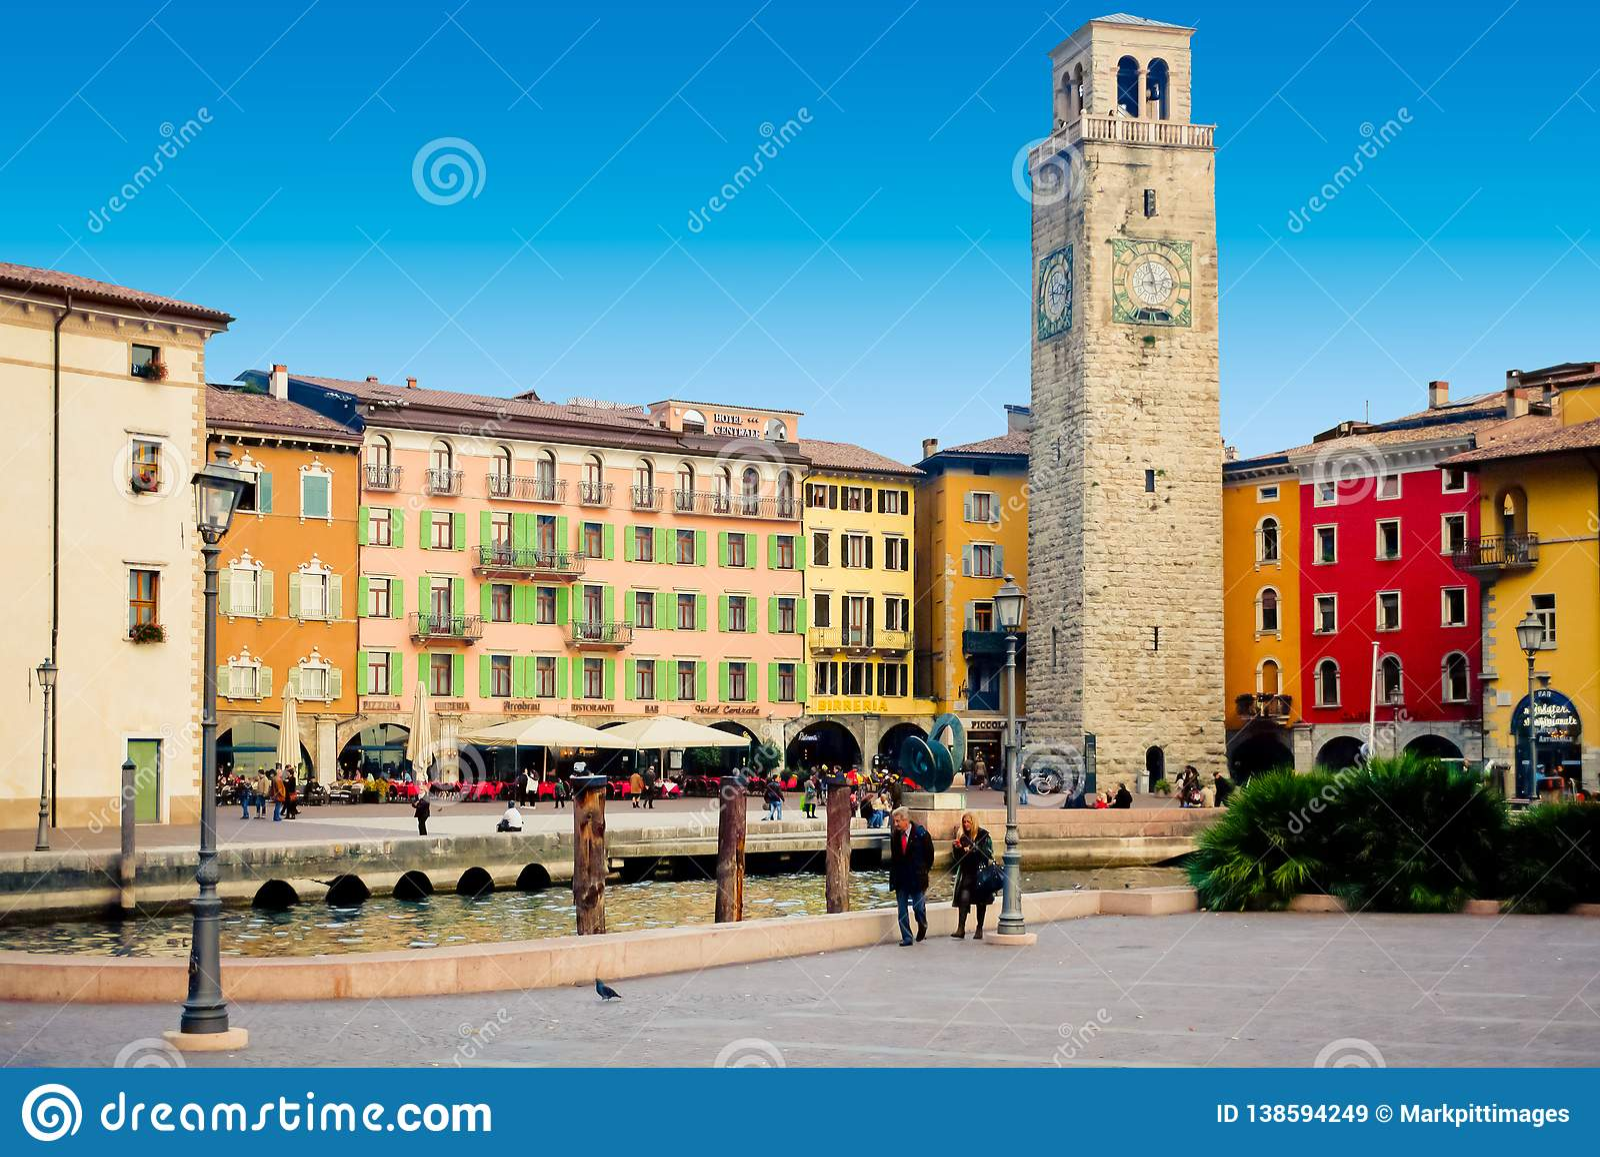 Riva del Garda square three November panoramic view